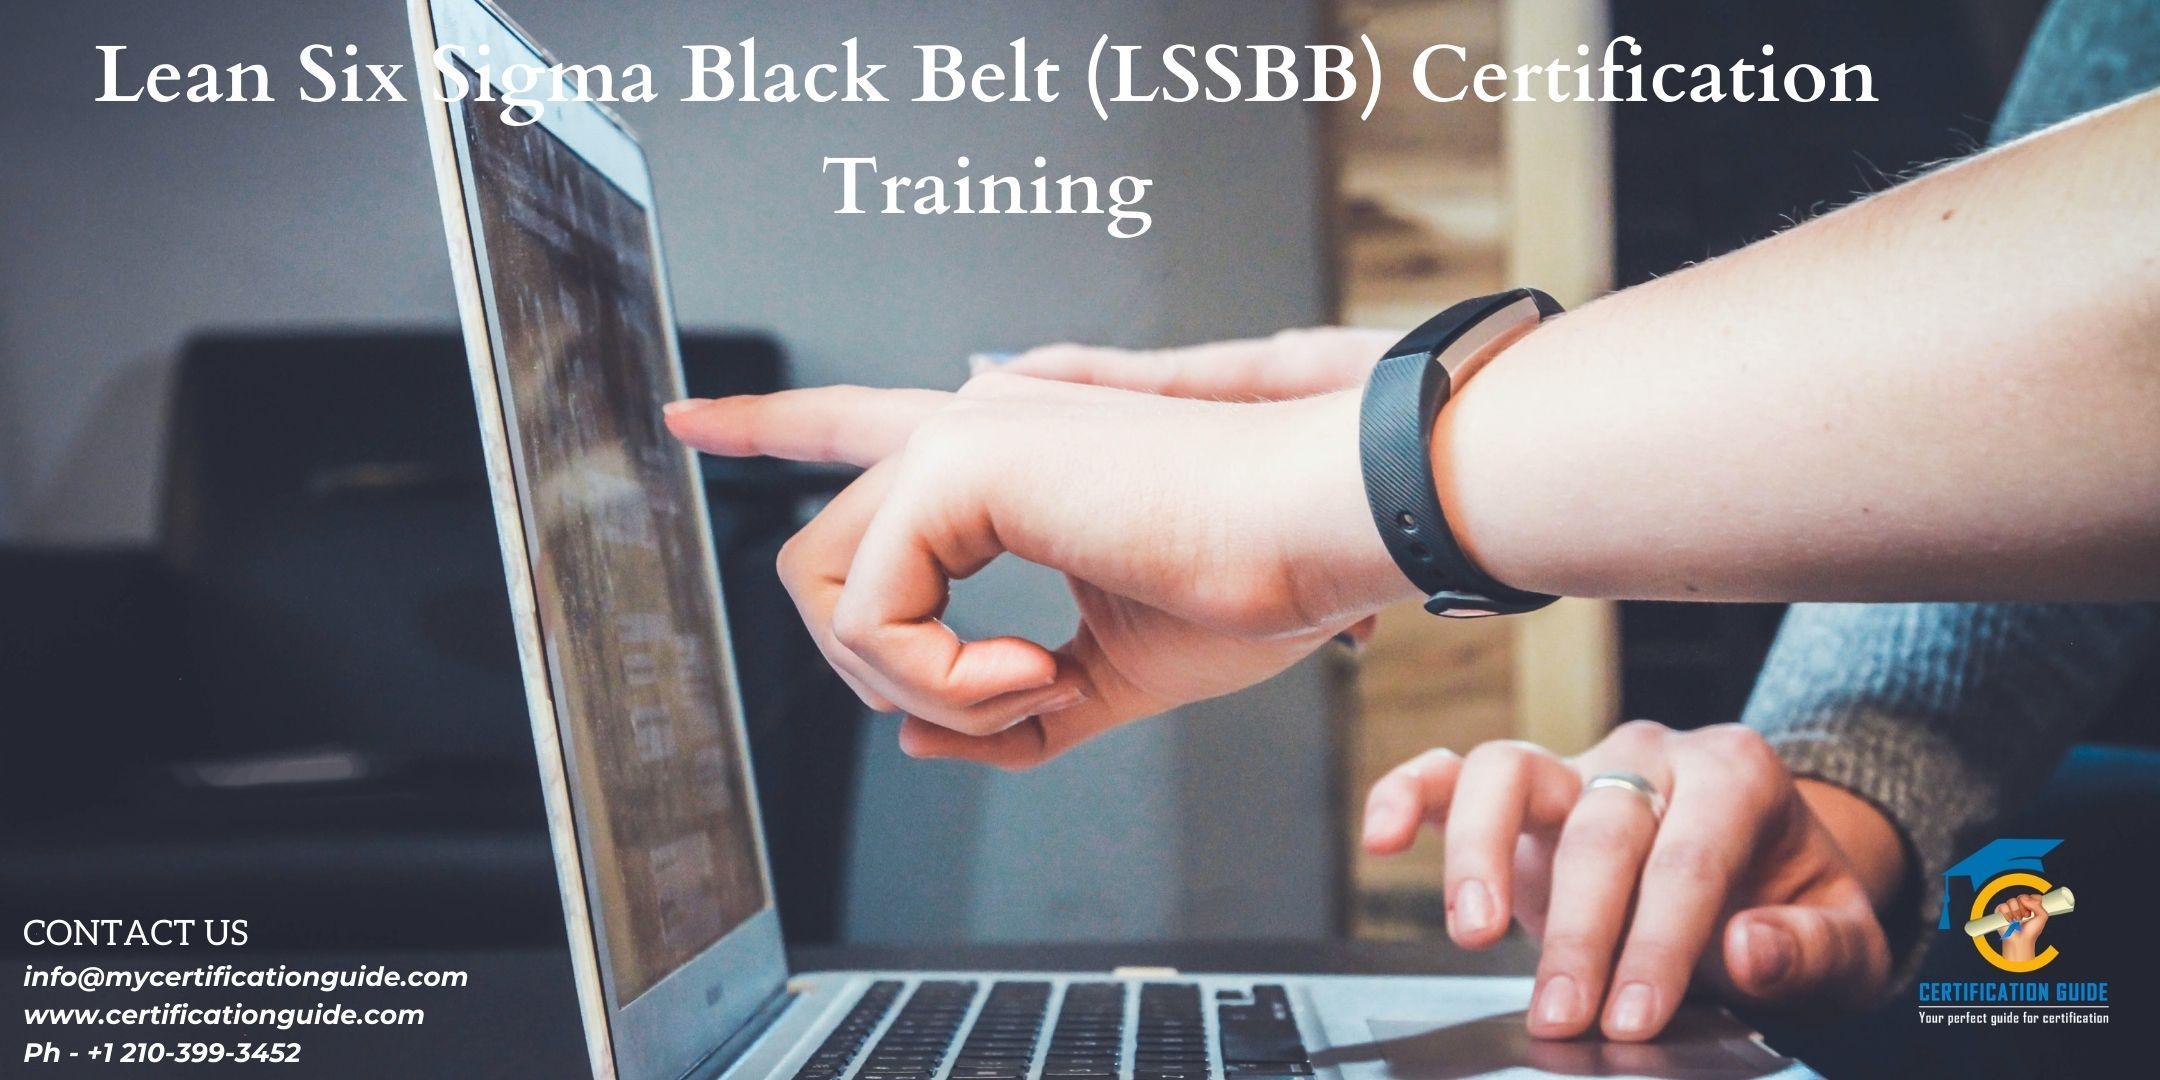 Lean Six Sigma Black Belt Certification Training in Edmonton, AB